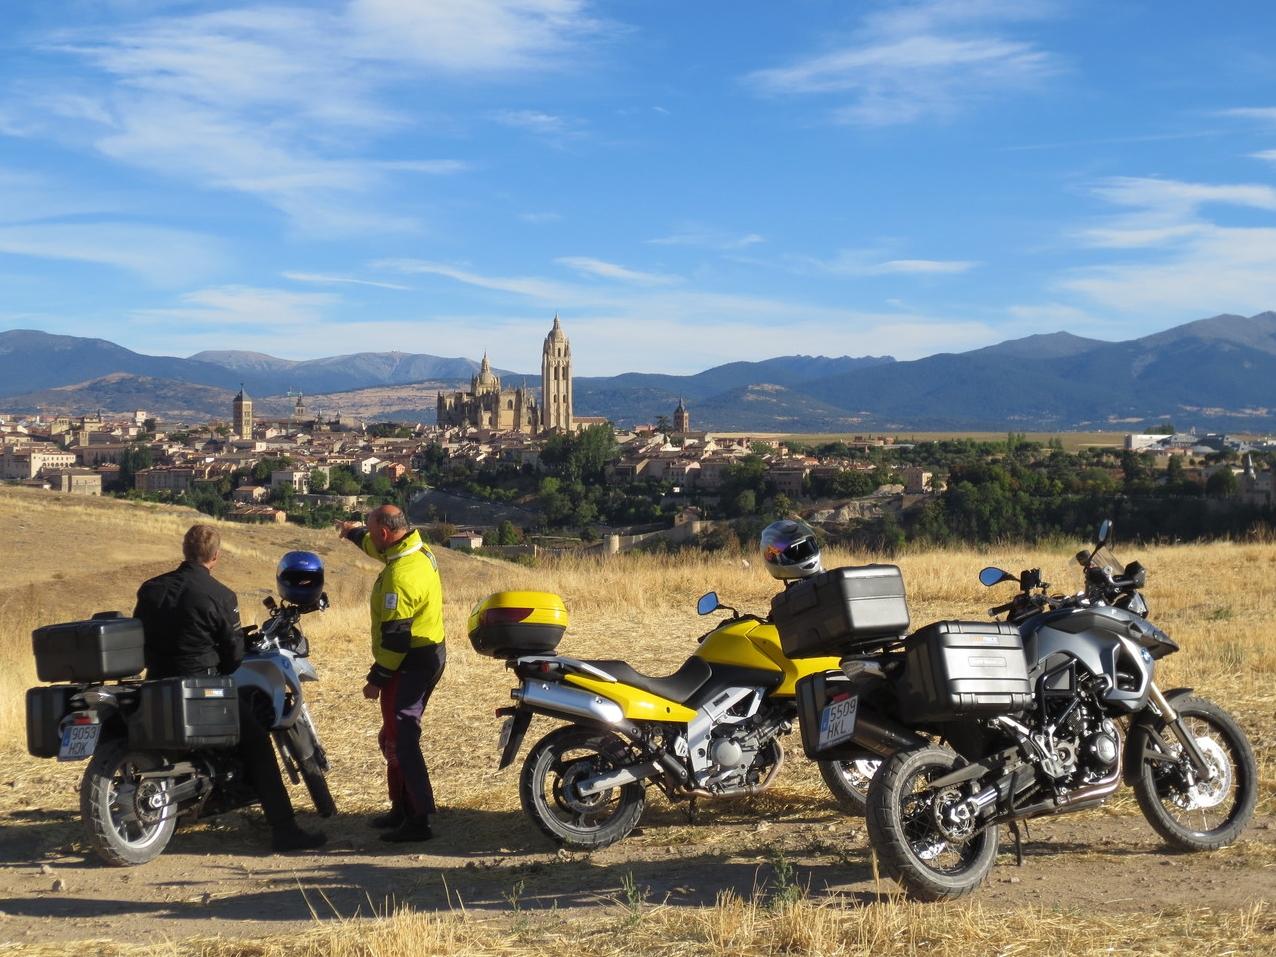 2012 09 MC Tur Curiel - Segovia 2012-09-13 303.JPG